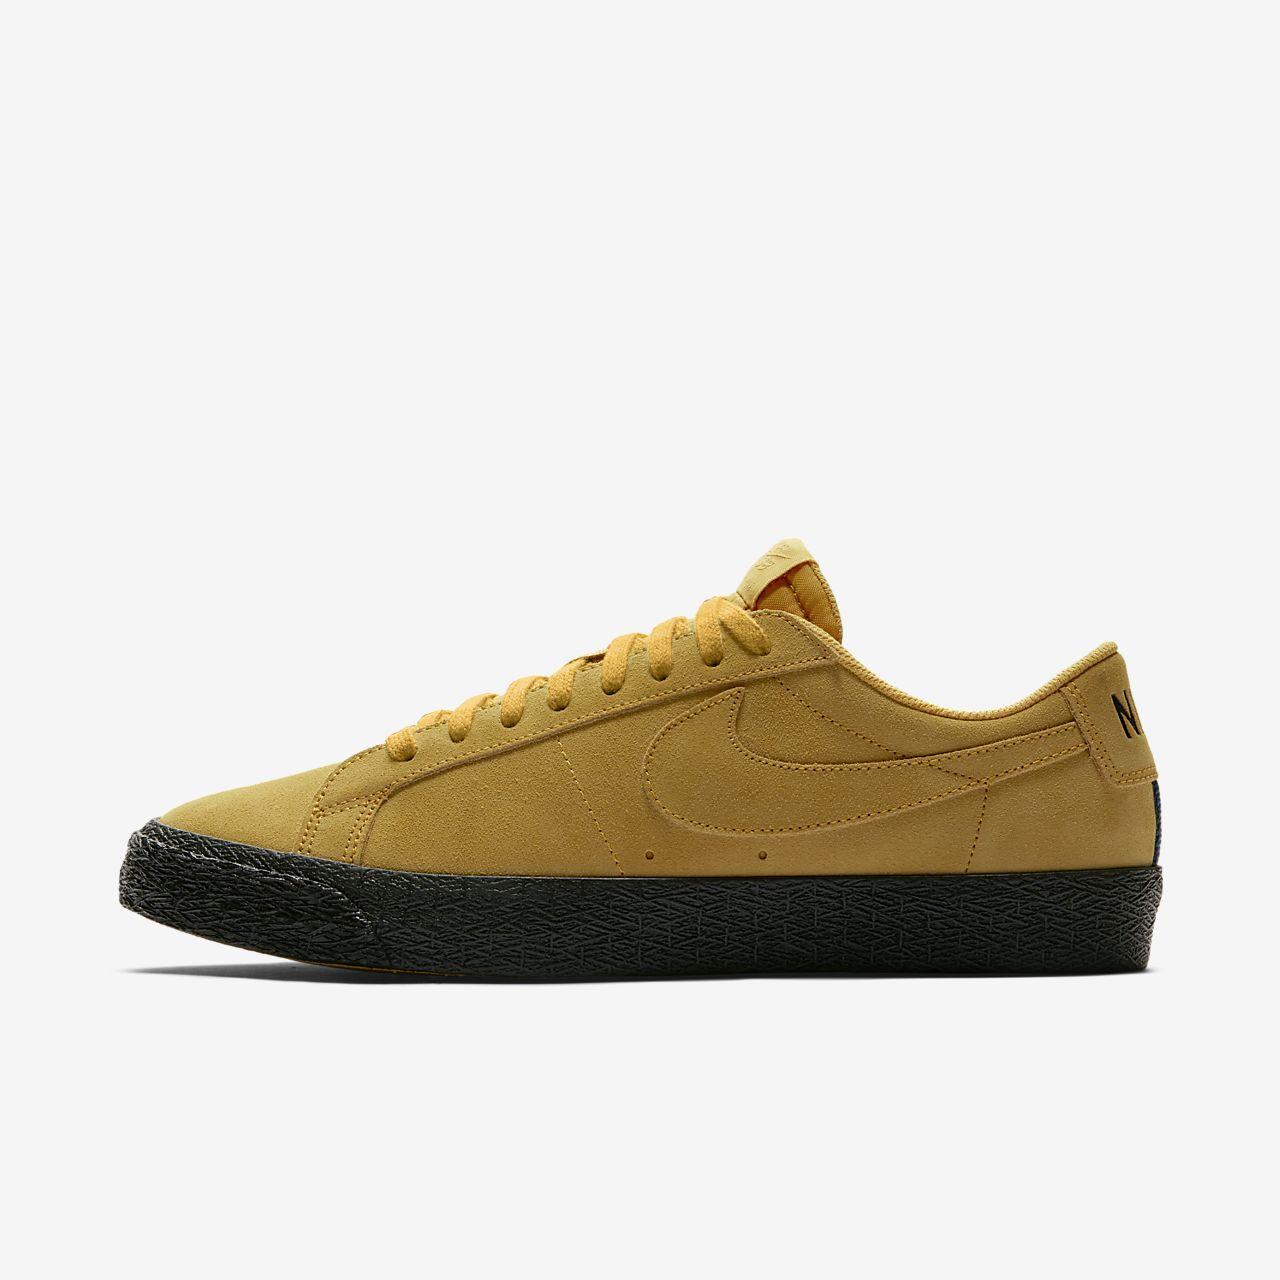 Nike SB Blazer Zoom Low Zapatillas de skateboard - Hombre